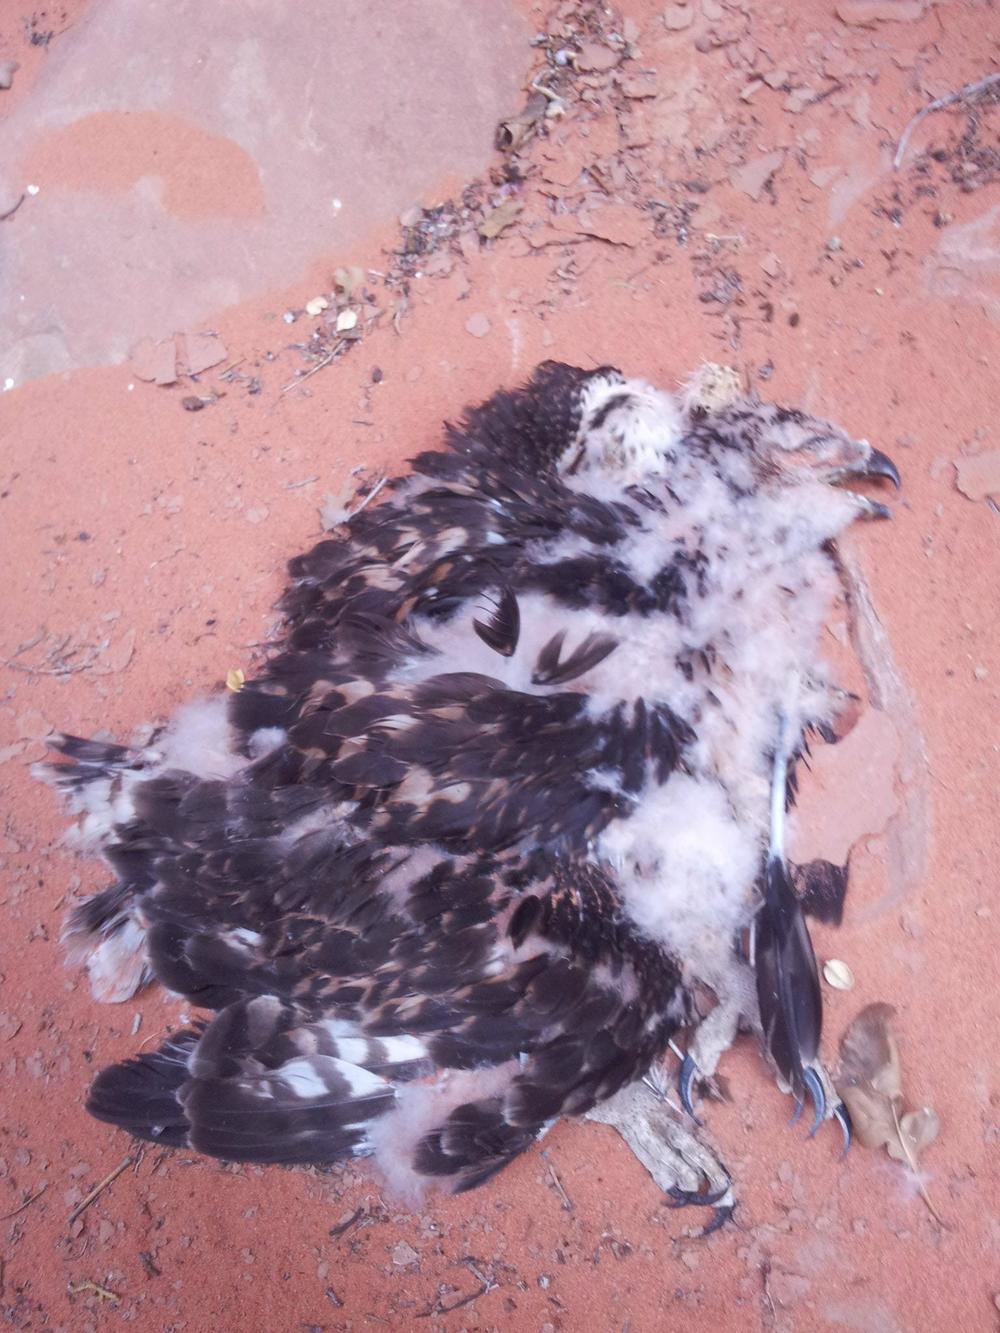 A dead baby peregrine falcon?